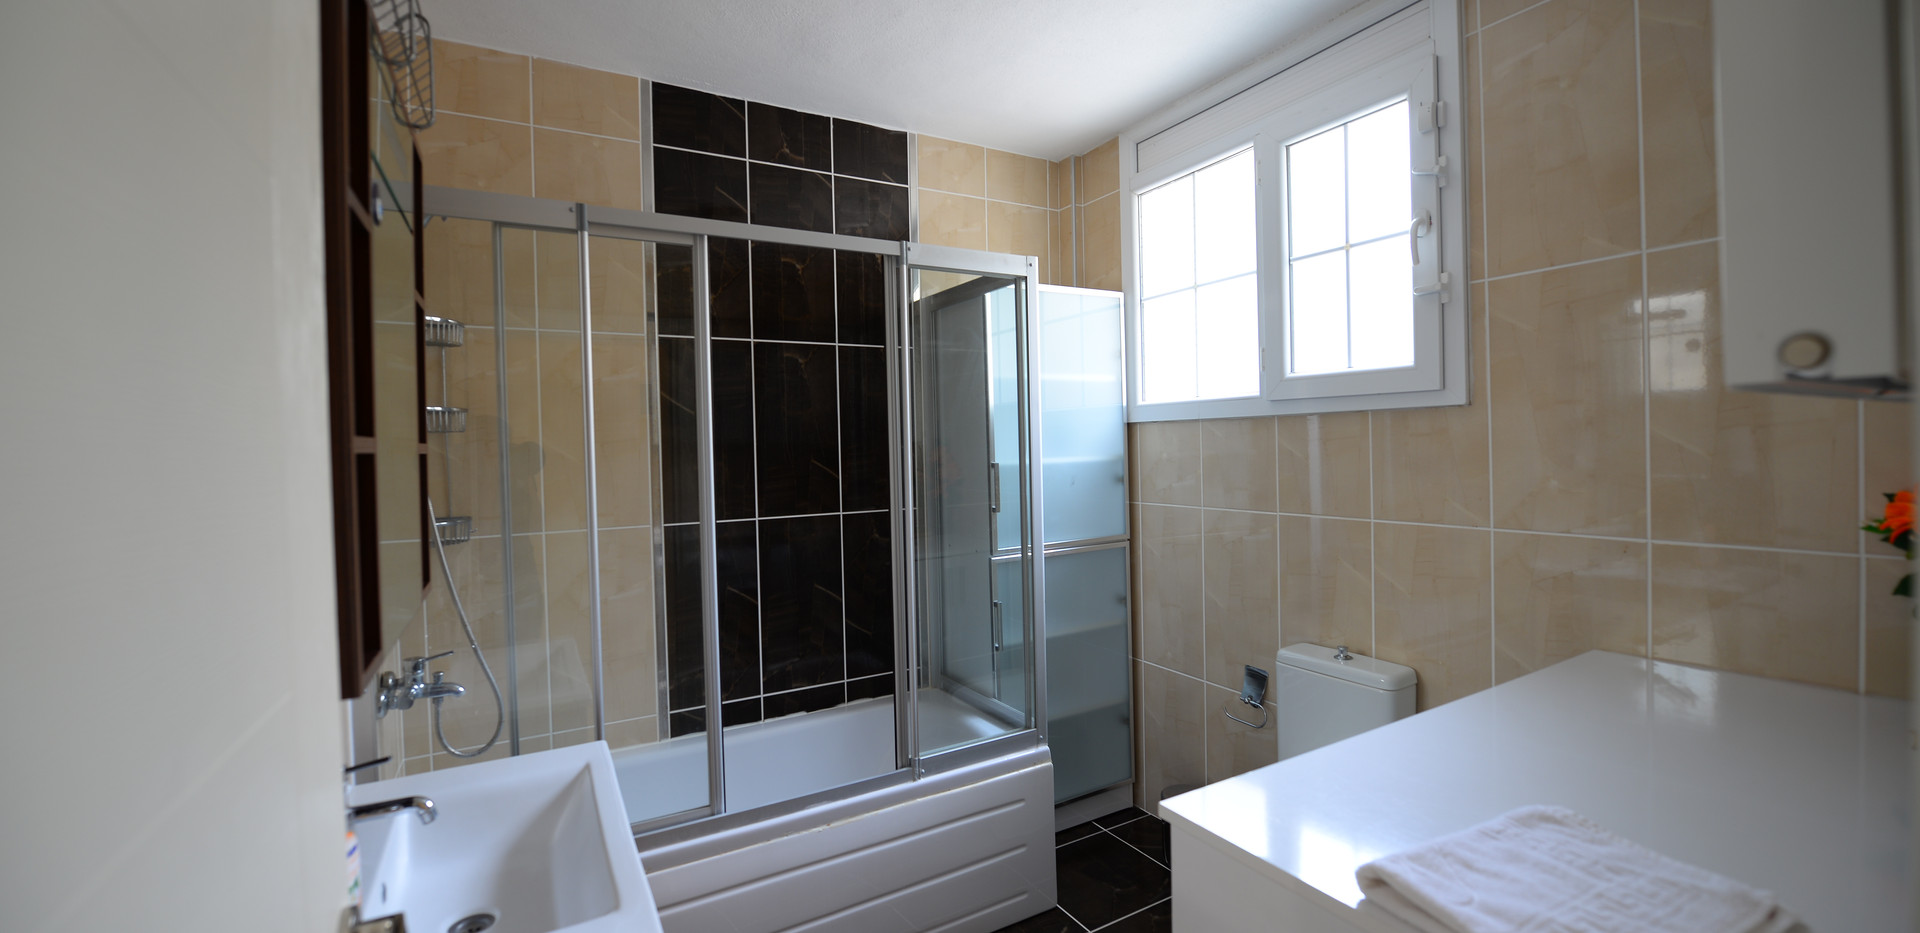 15. bathroom.JPG